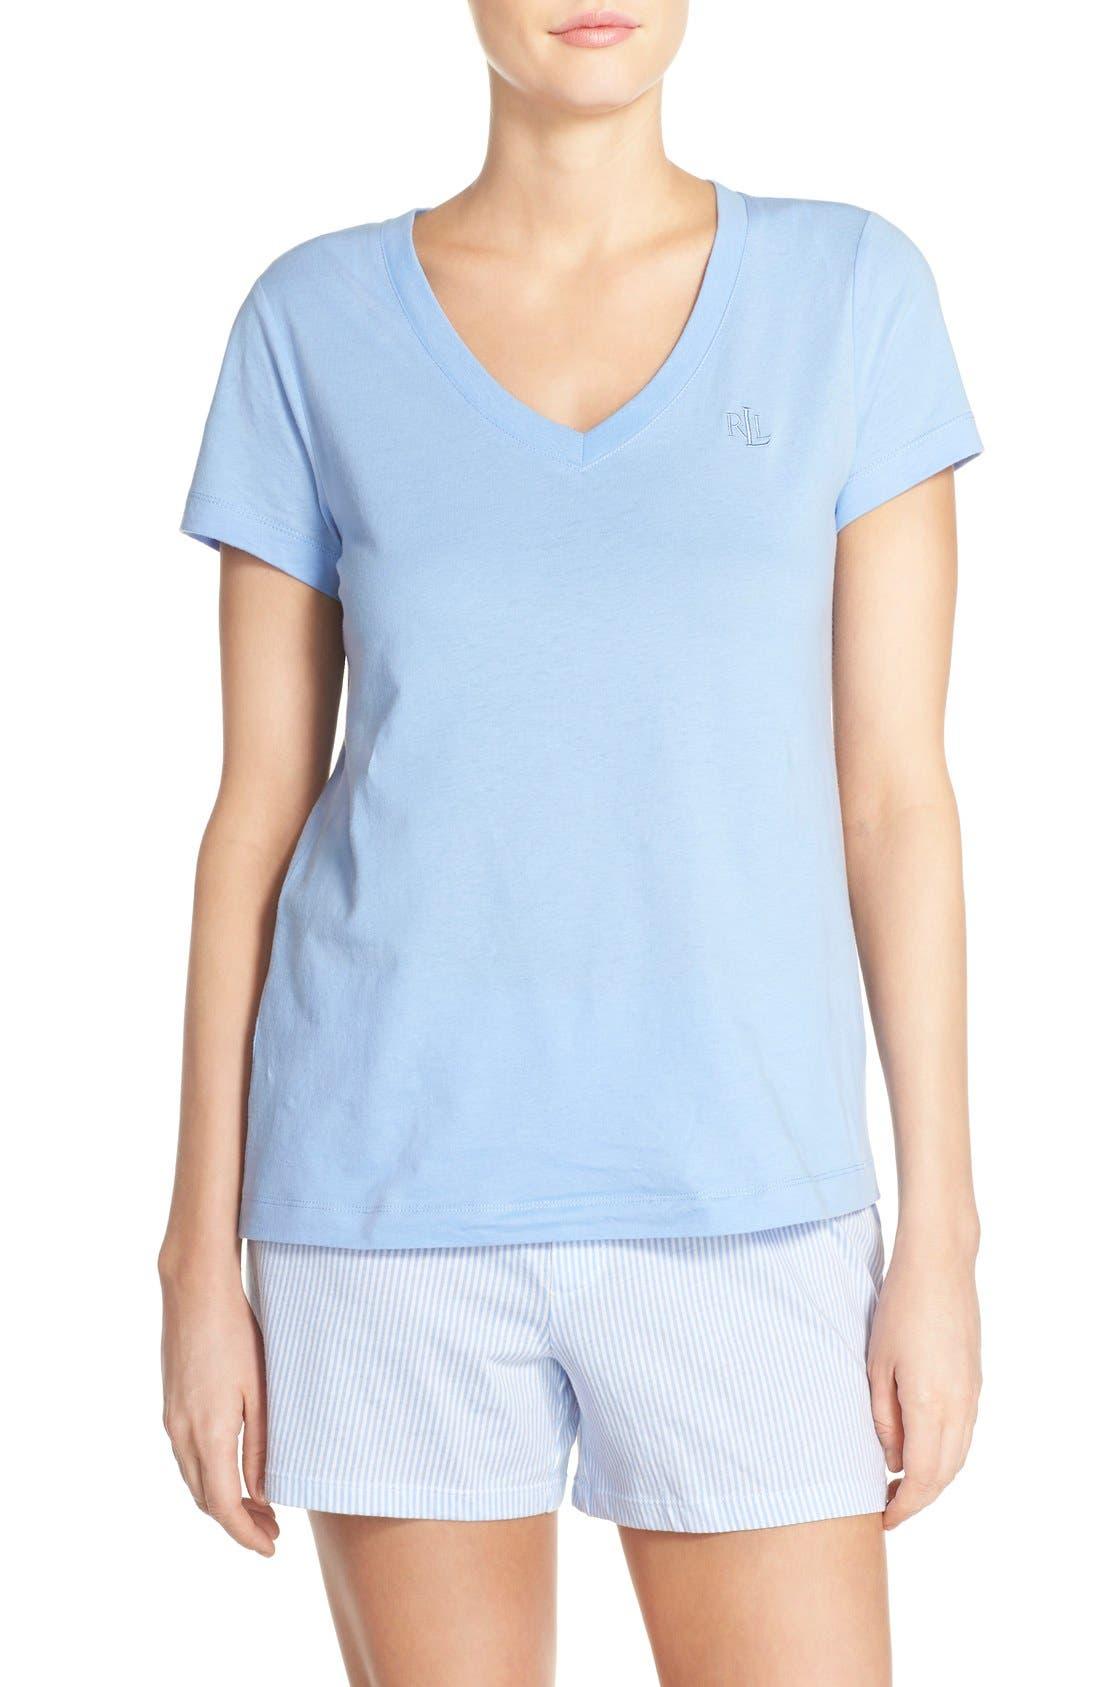 Alternate Image 1 Selected - Lauren by Ralph Lauren Sleepwear Short Sleeve Sleep Tee